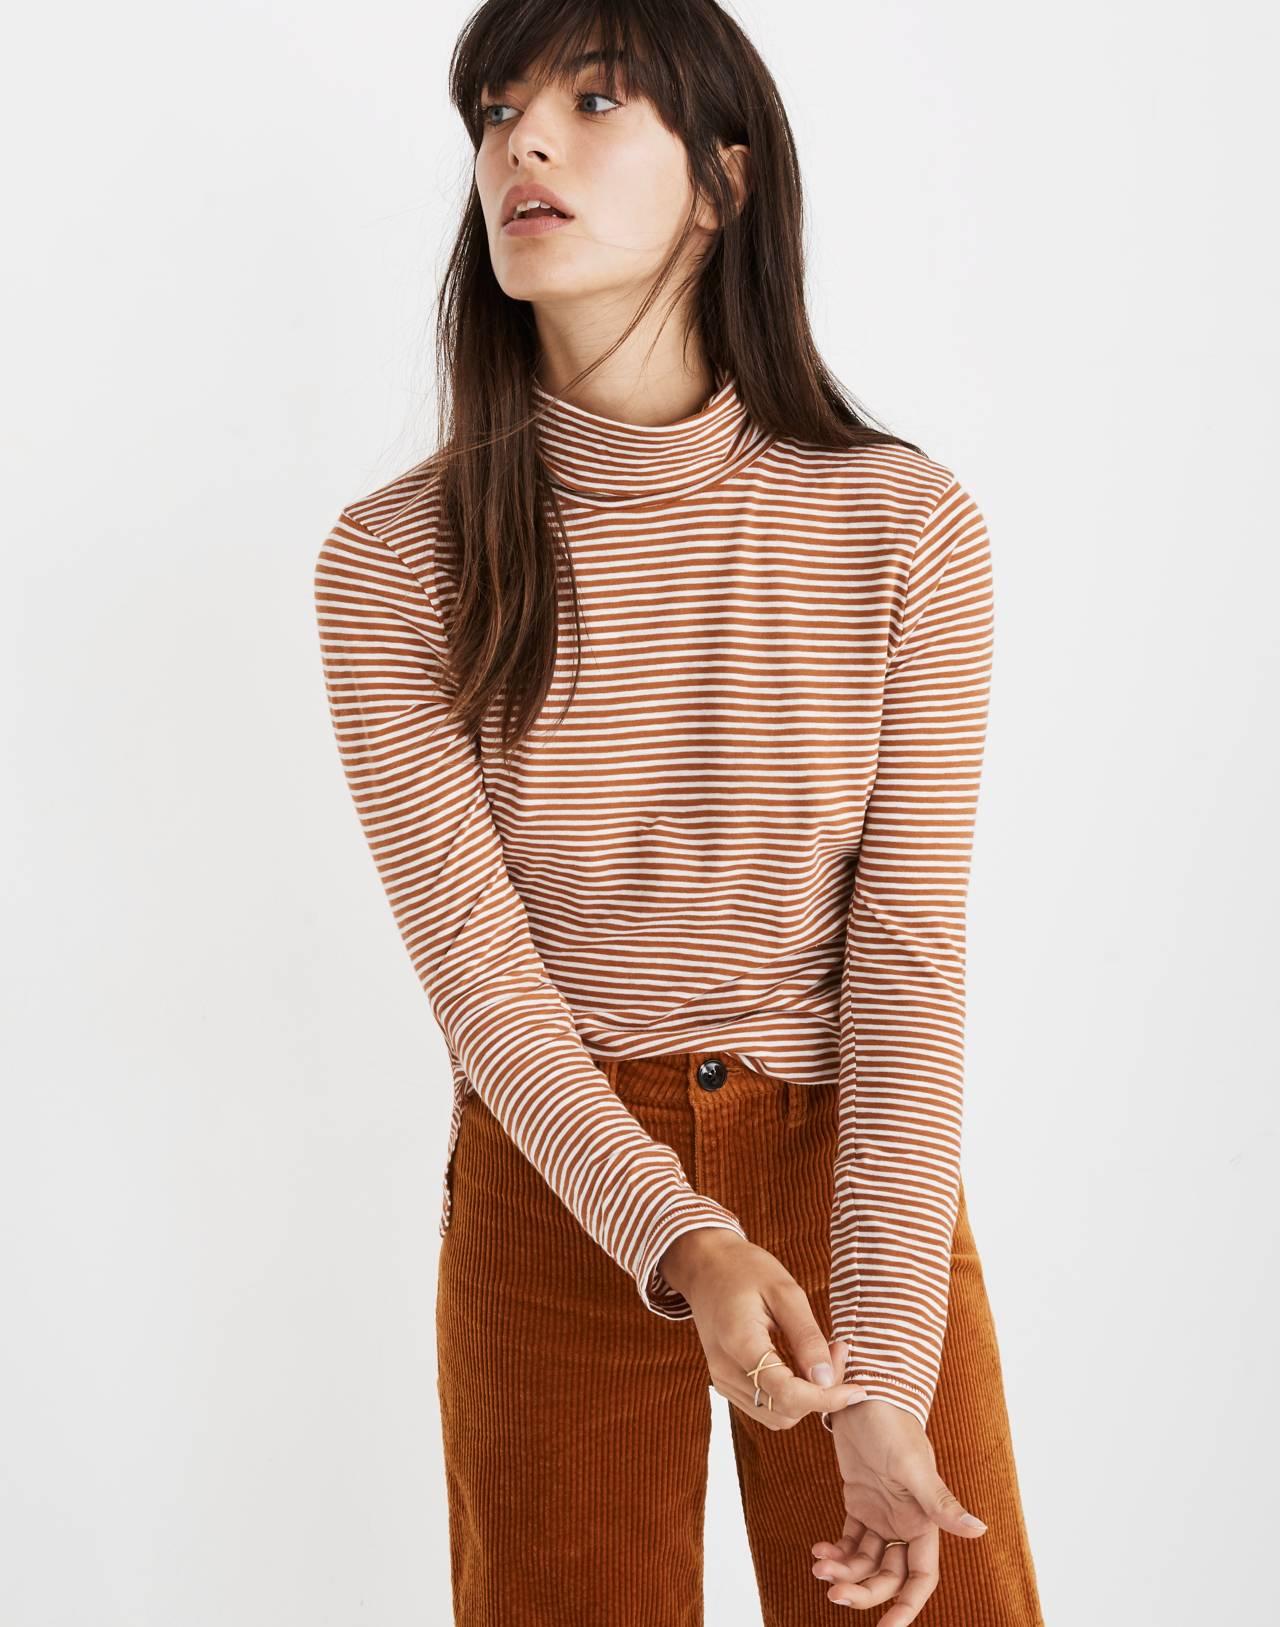 Whisper Cotton Turtleneck in Daniela Stripe in warm nutmeg image 1